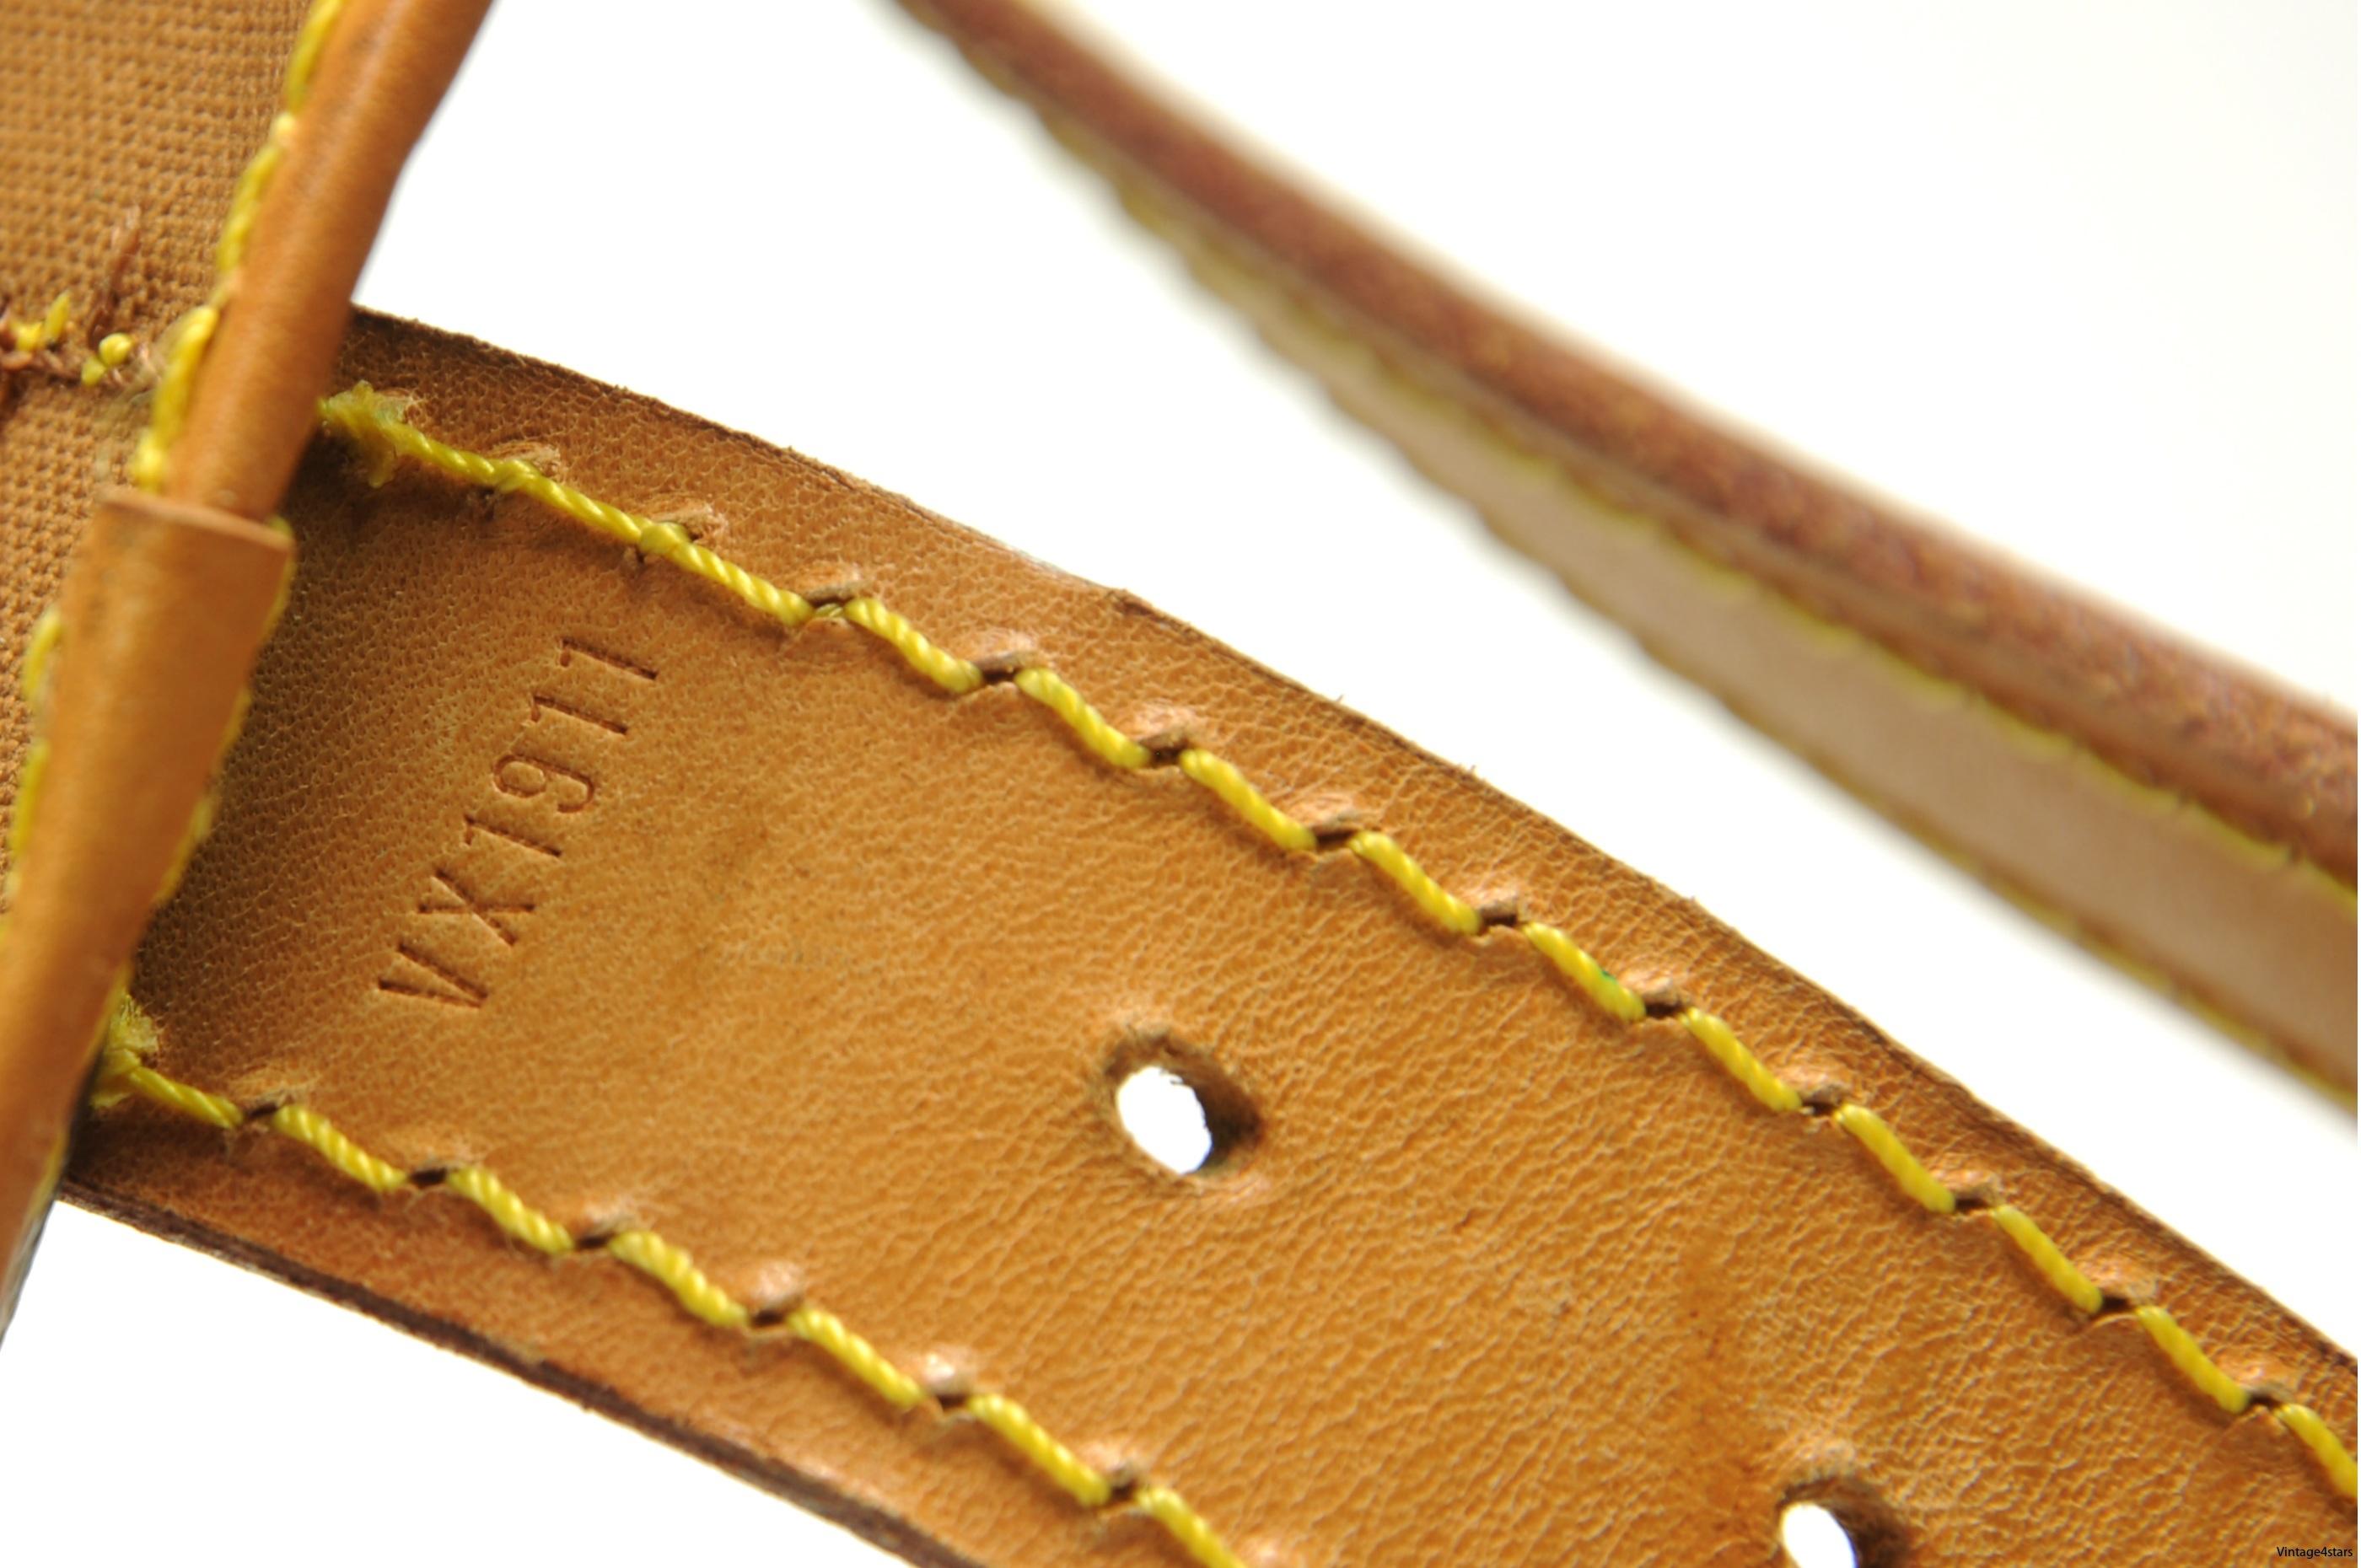 Louis Vuitton Sac Chasse Kleber 015